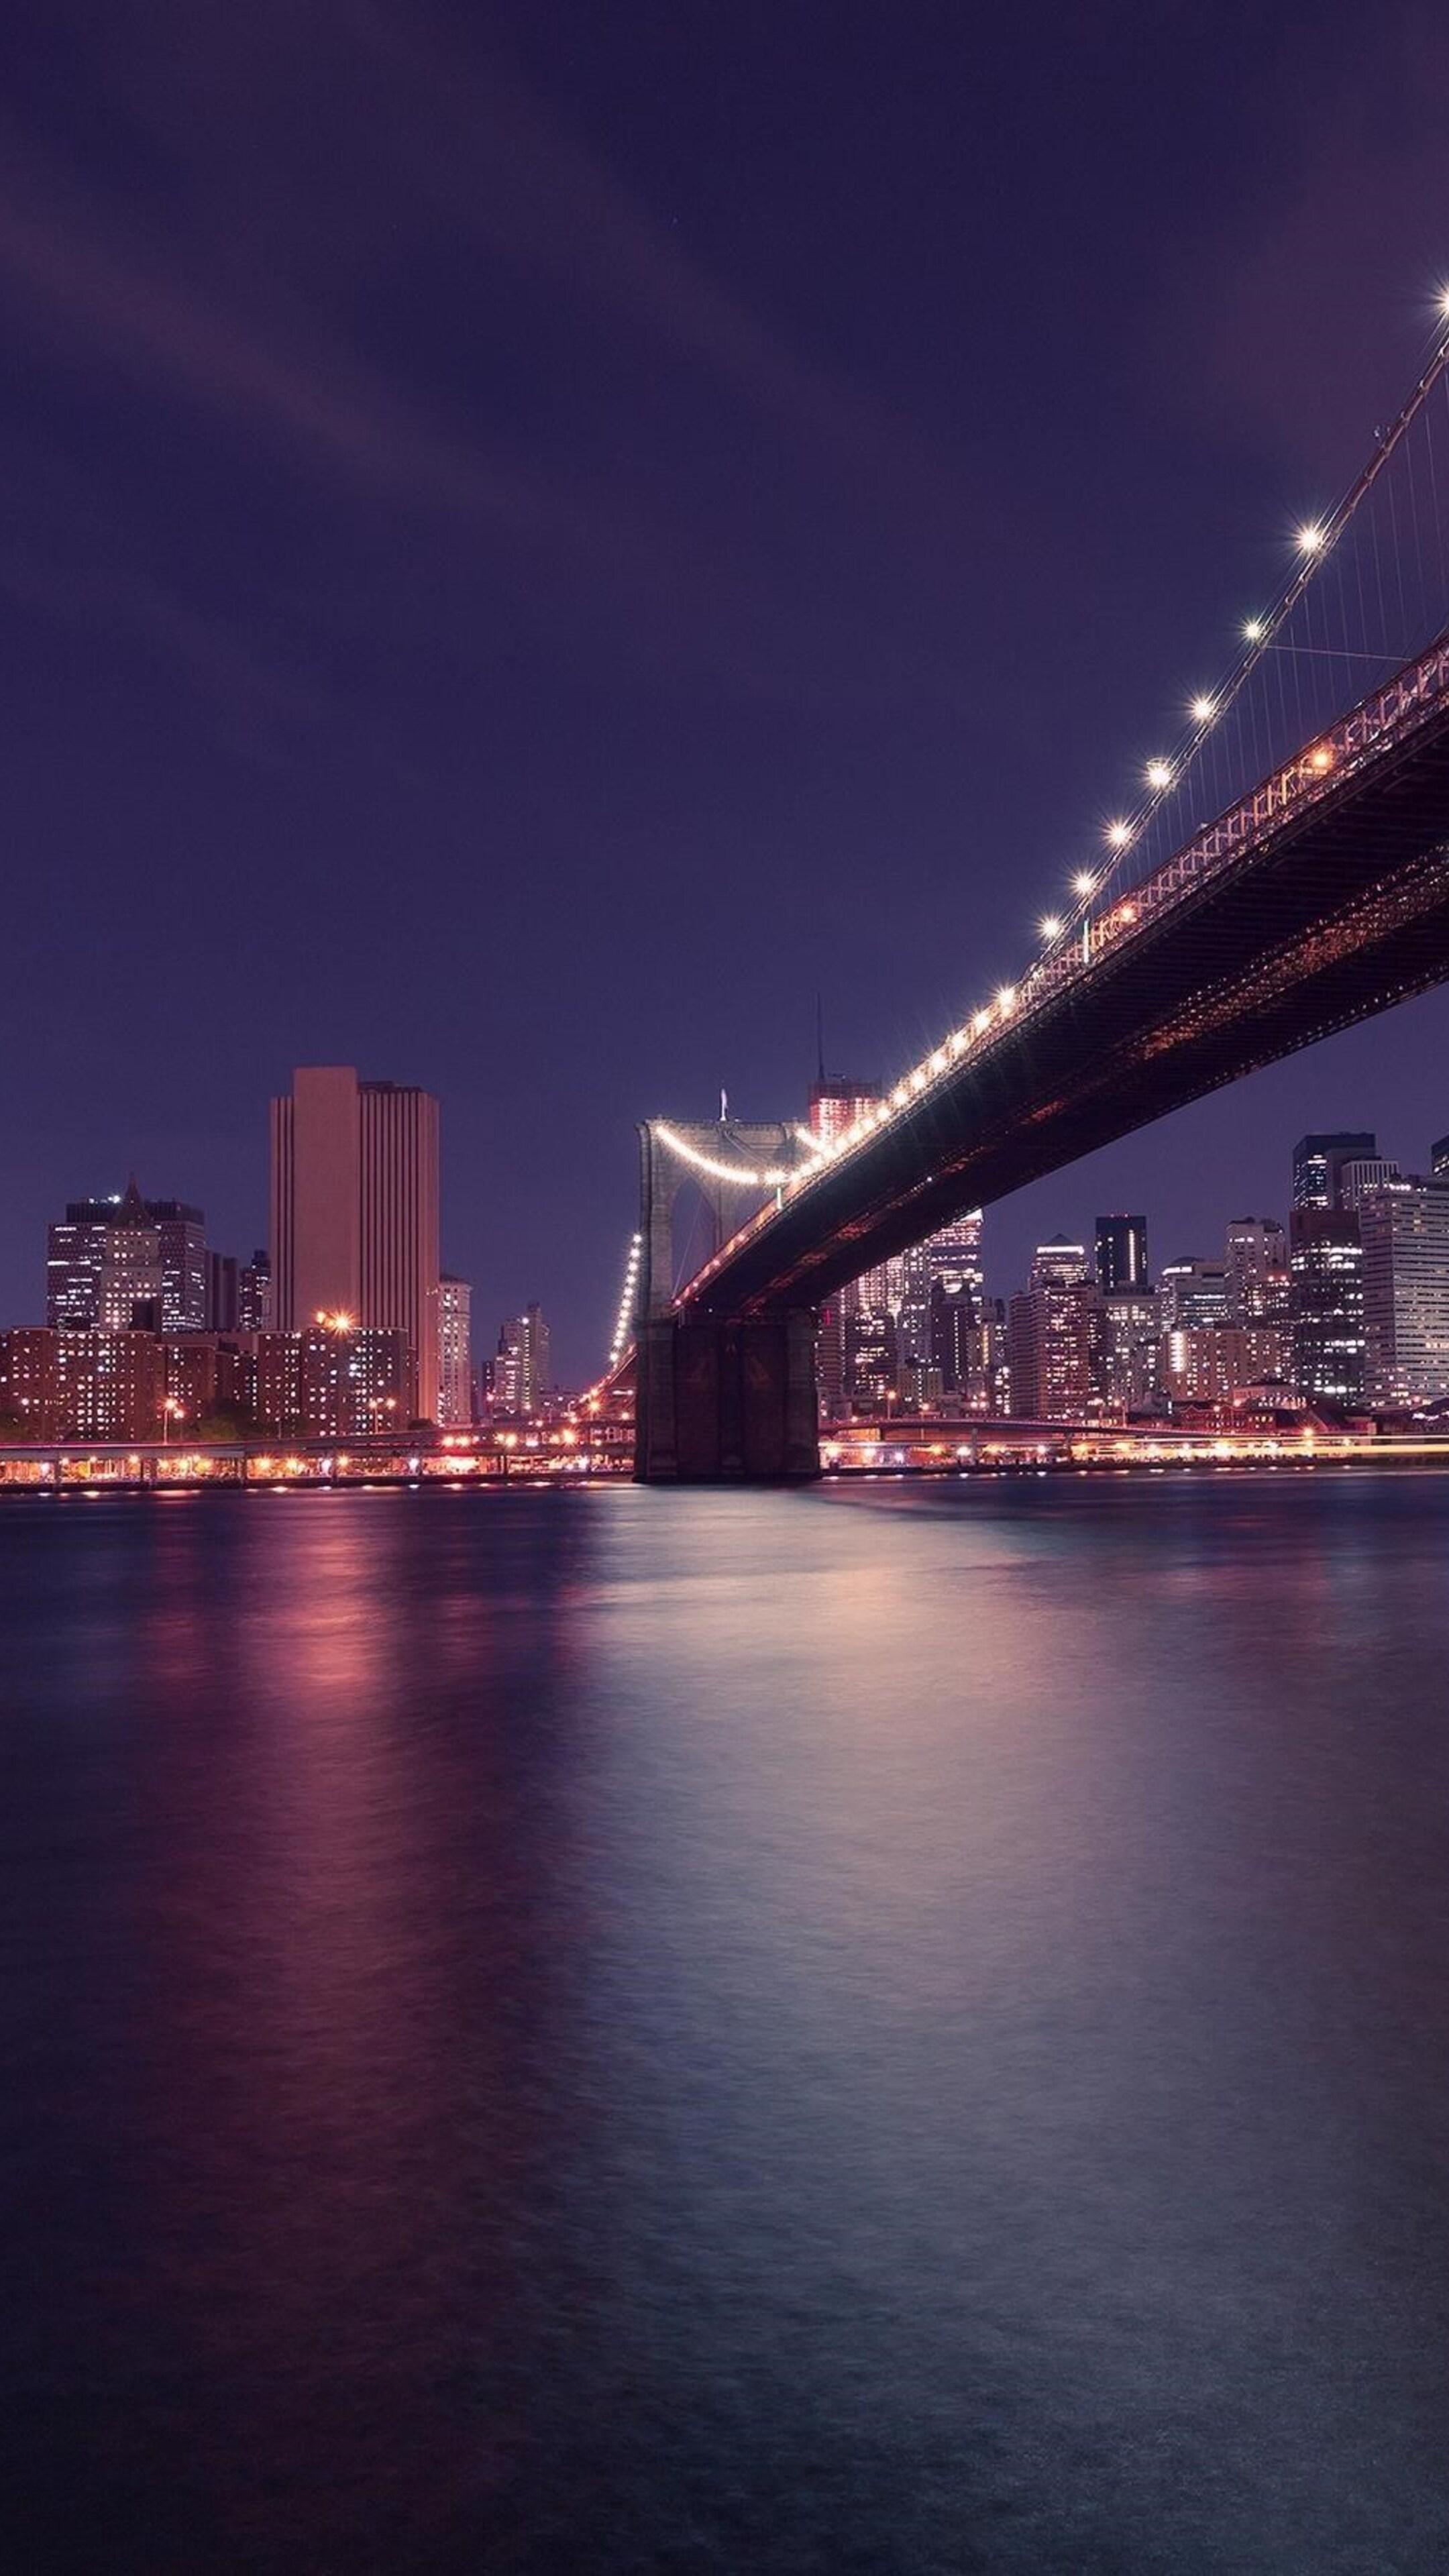 brooklyn-bridge-manhattan-in-new-york.jpg